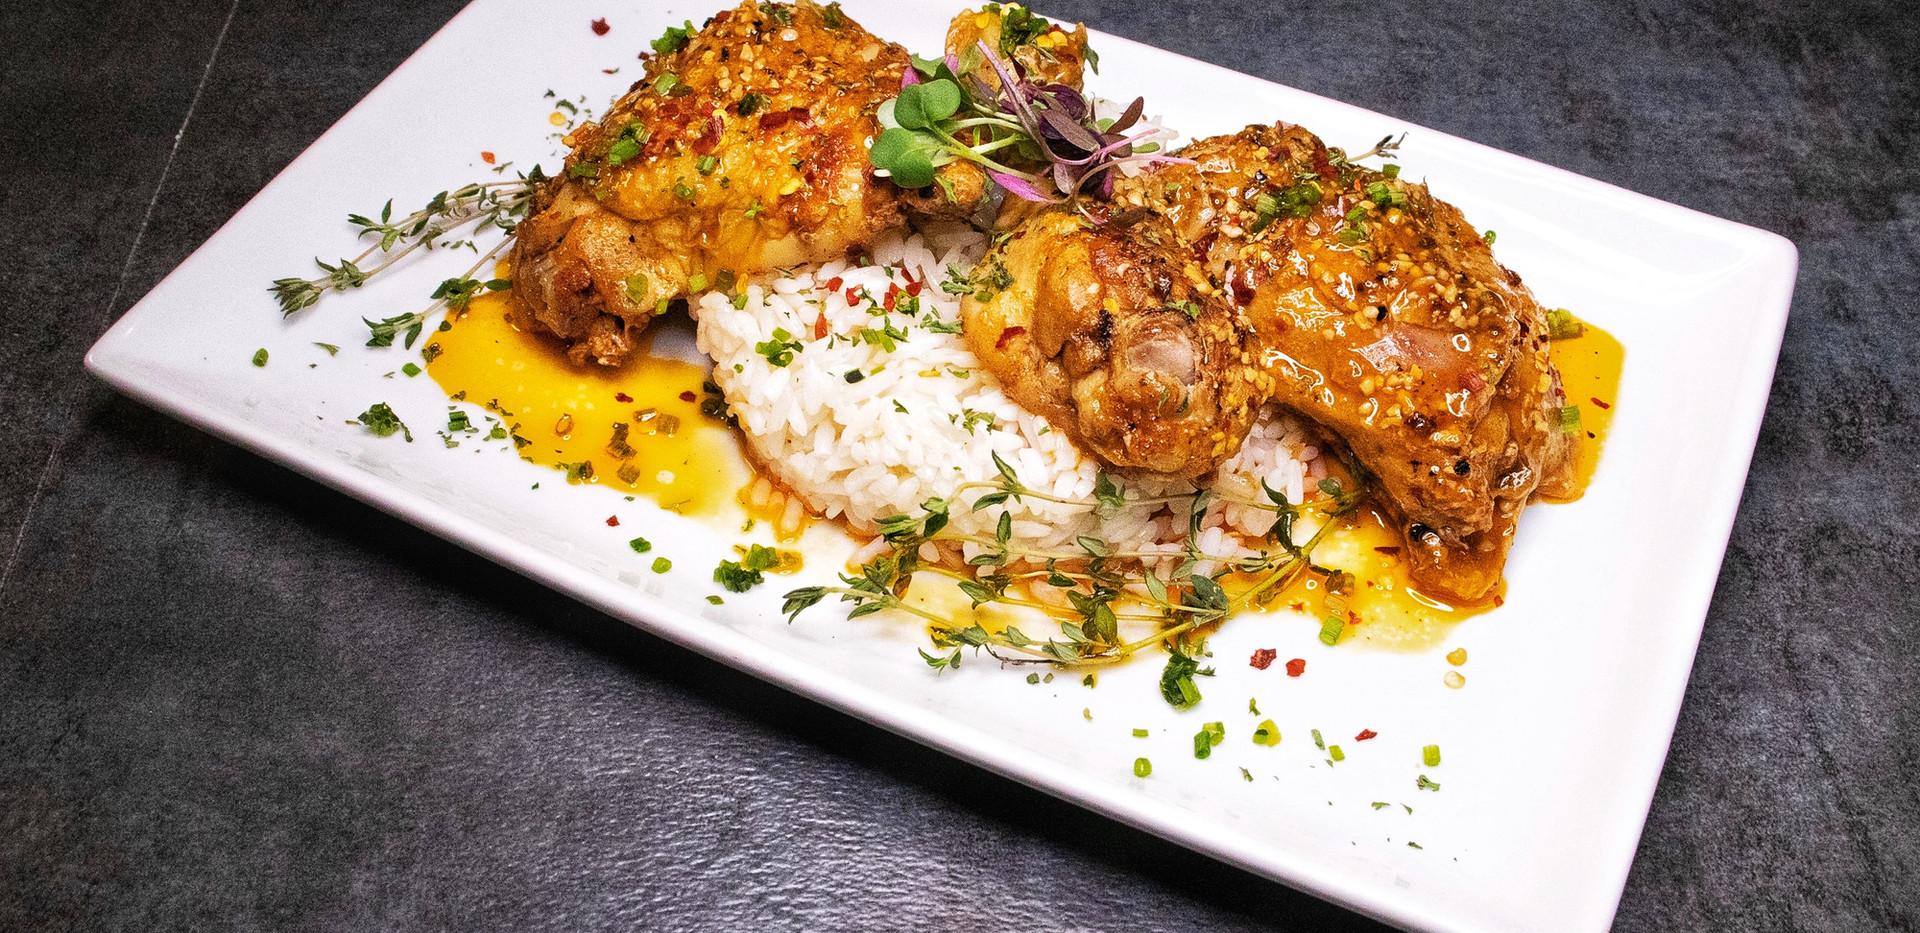 BAR 2200 Herb Roasted Chicken n Rice